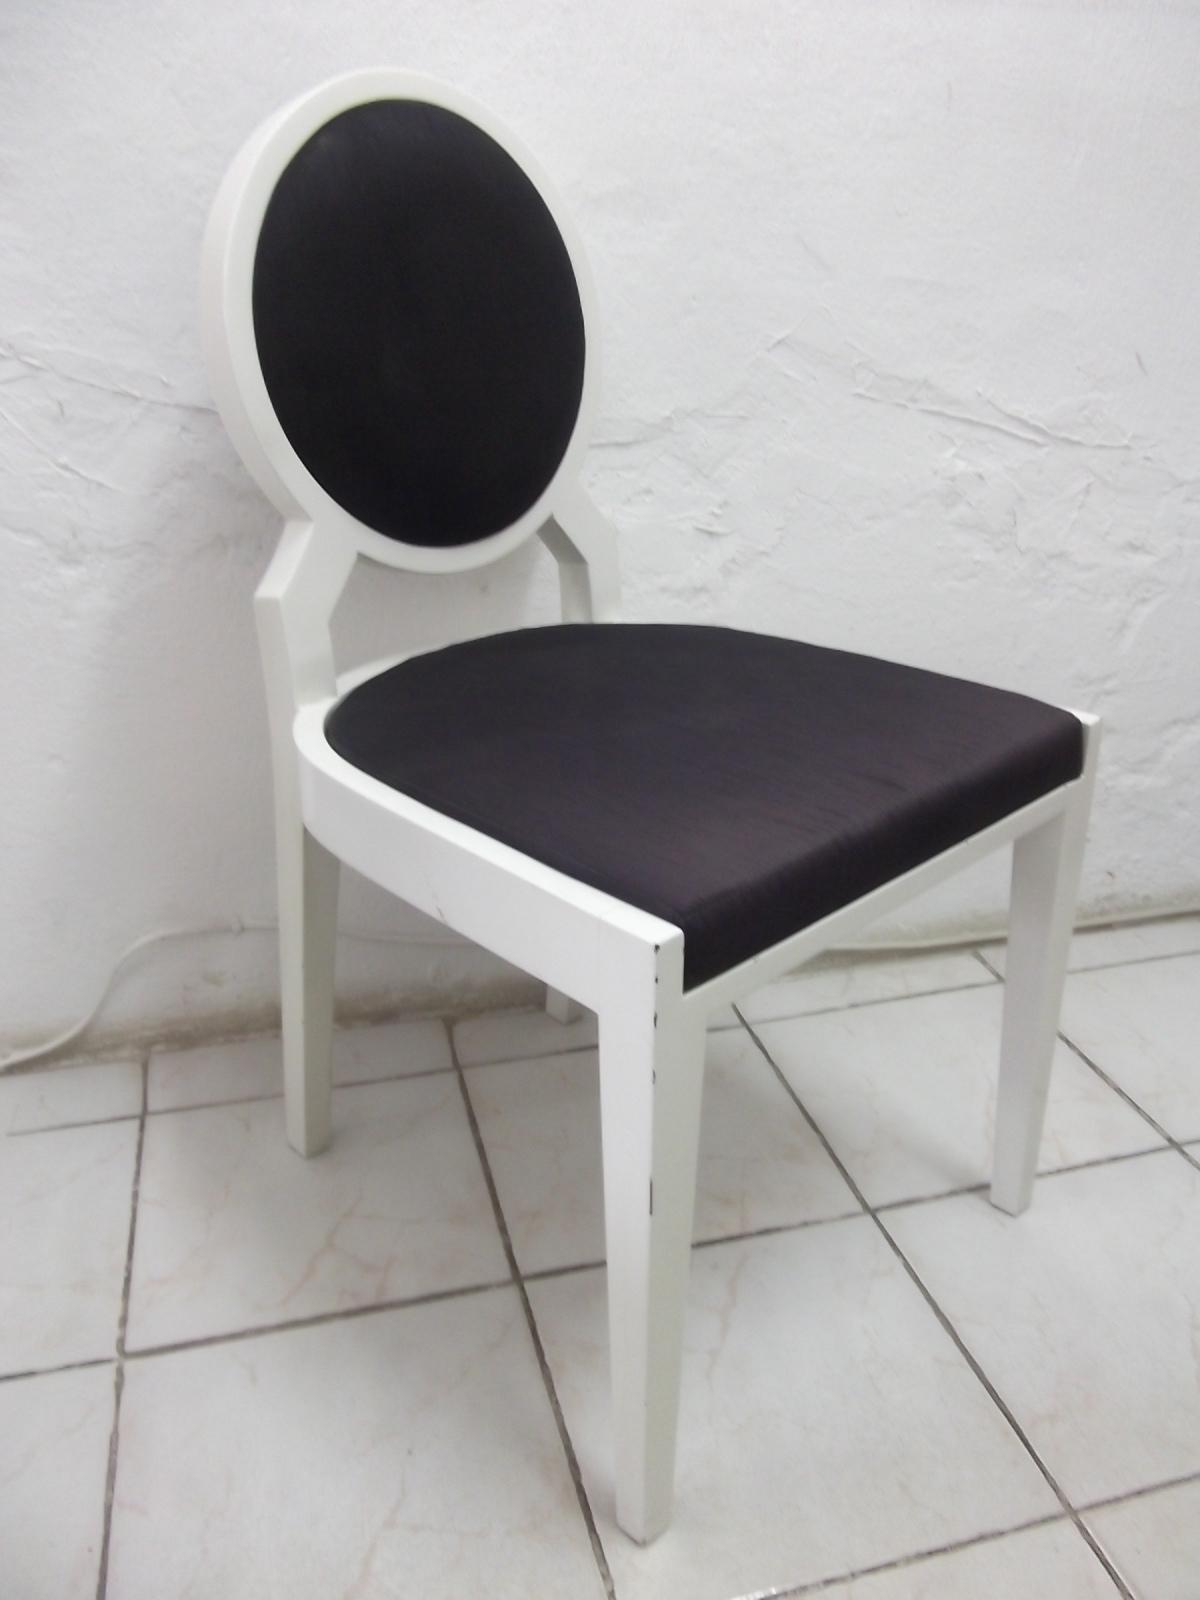 Cadeira e Mesa: Cadeiras para restaurante #615951 1200x1600